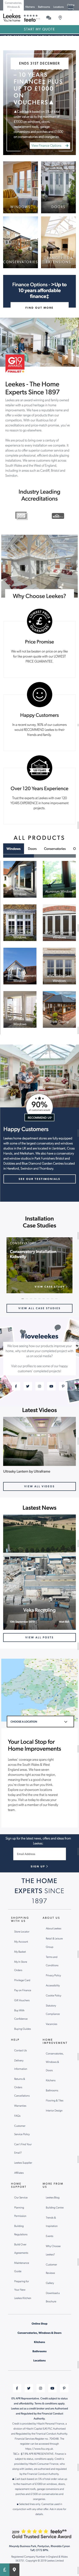 responsive website phone image